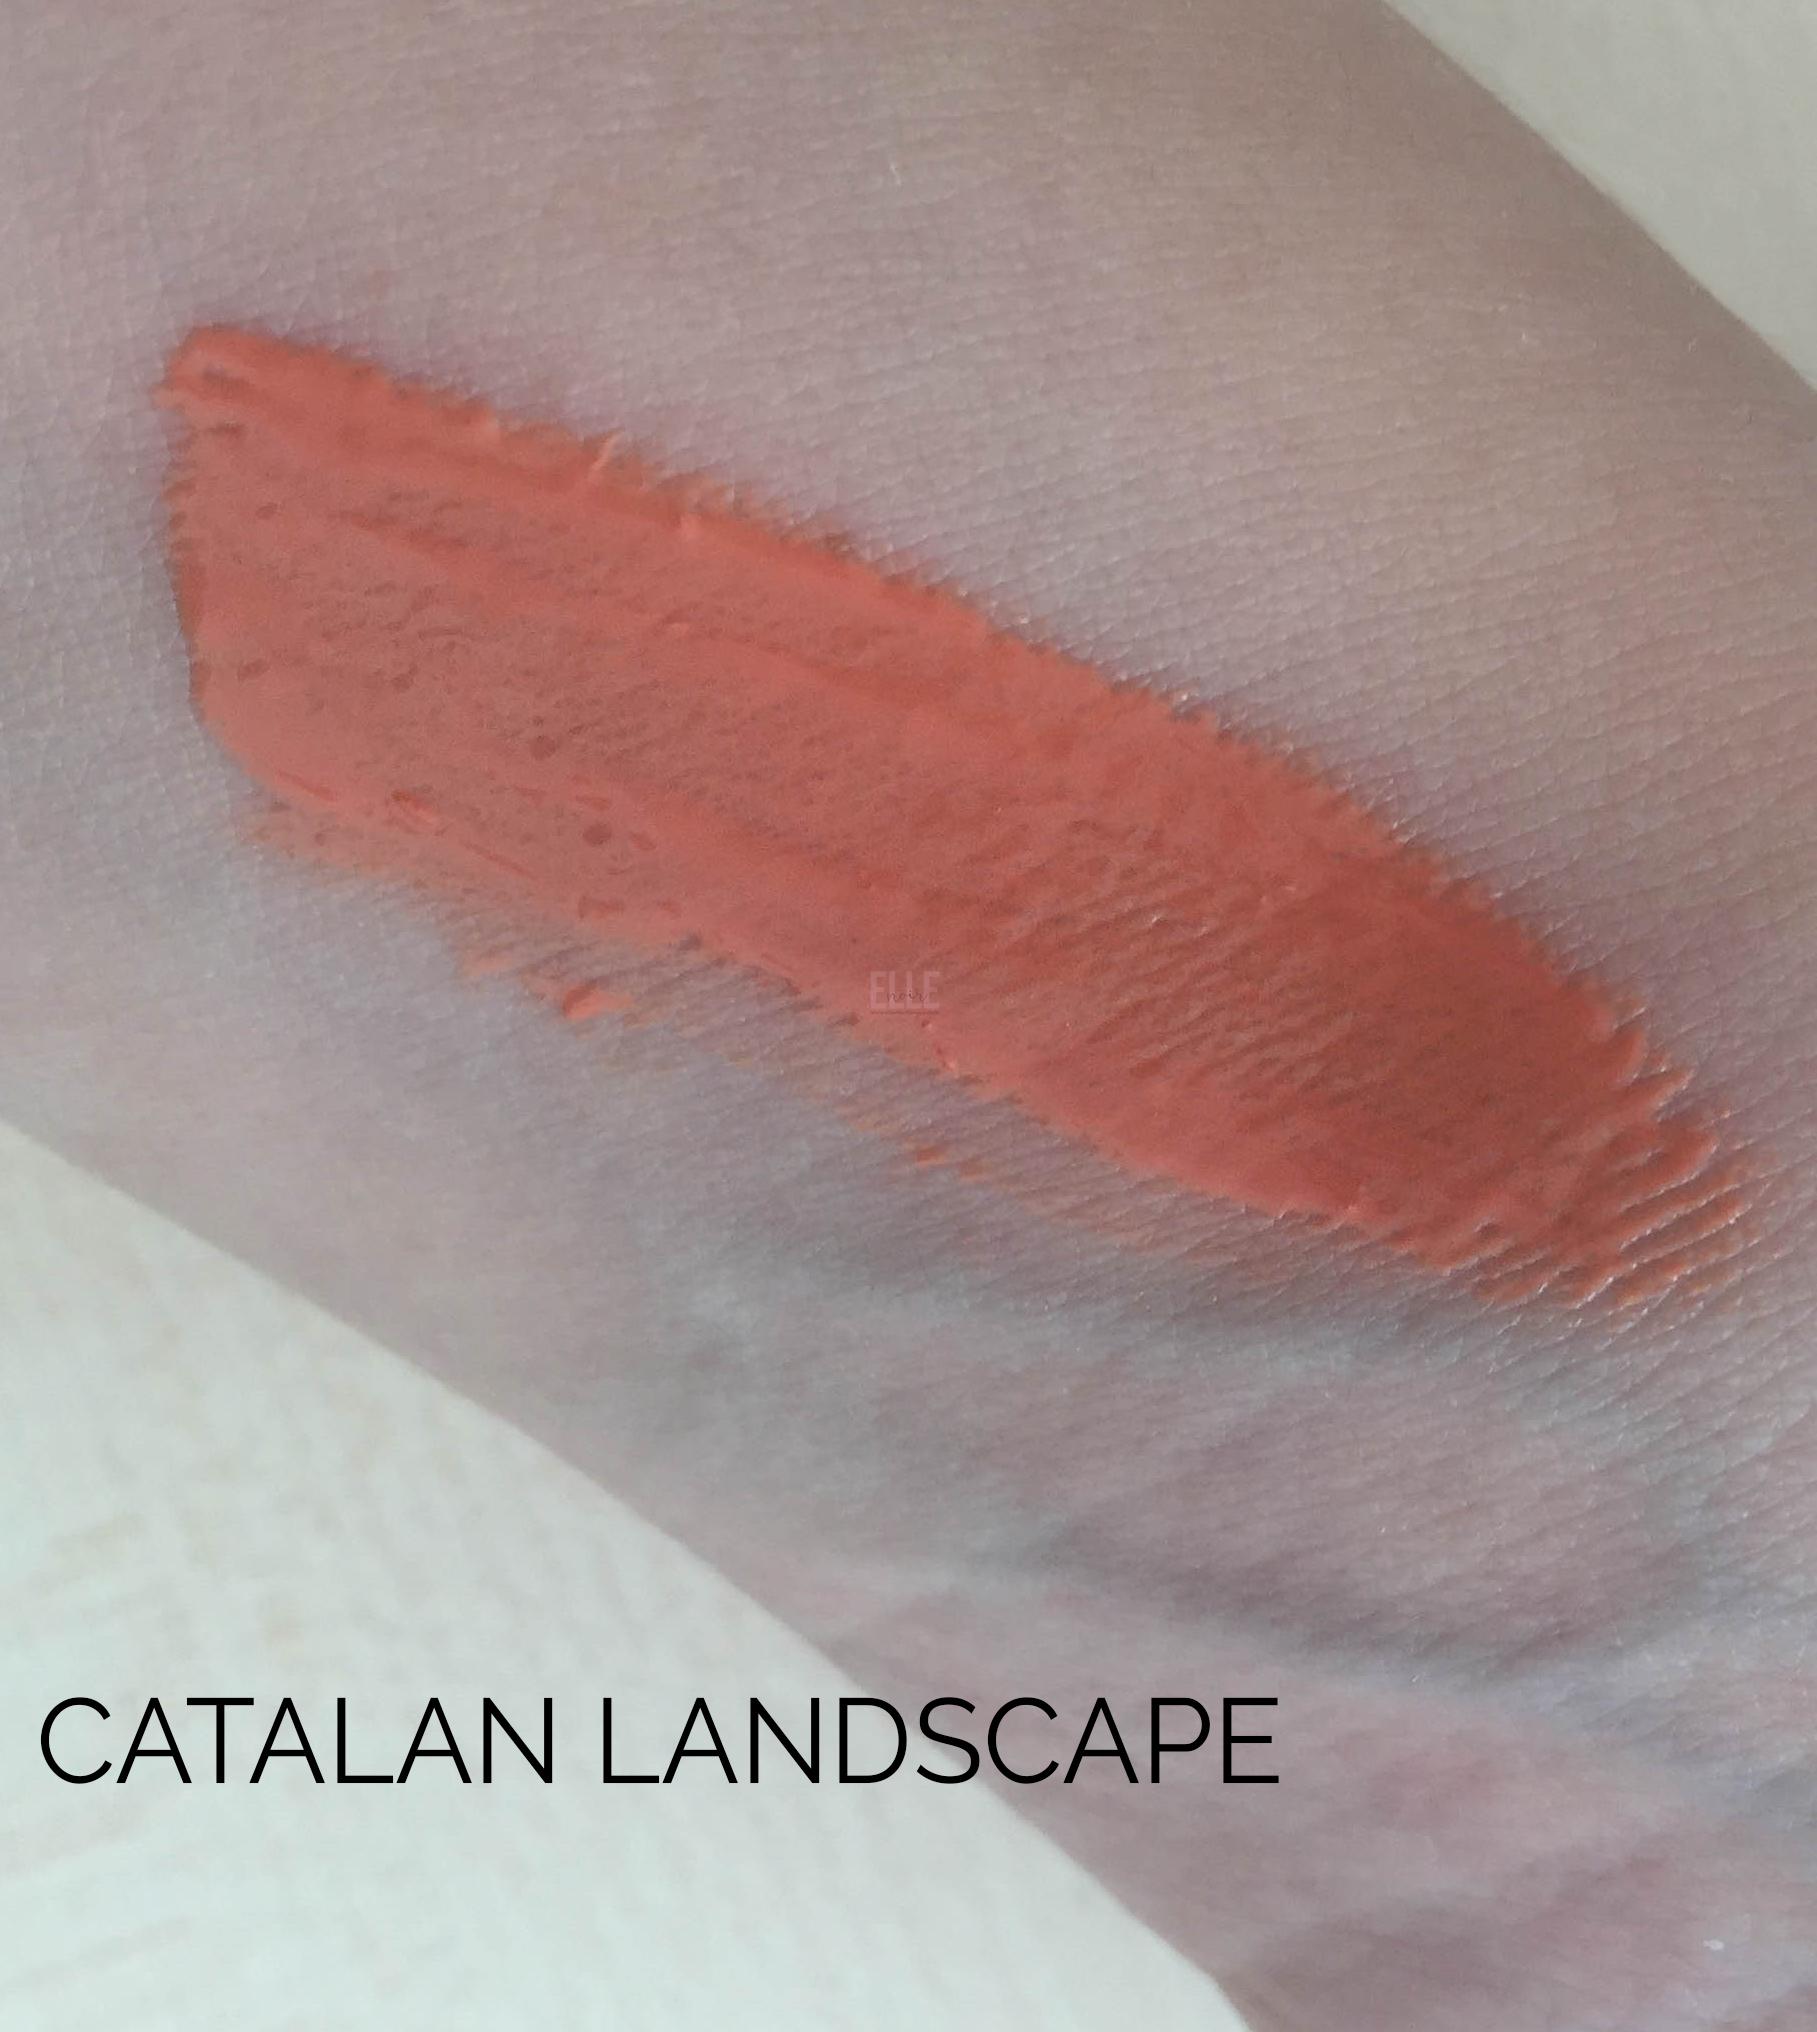 Swatch Catalan Landscape Neve Cosmetics Vernissage